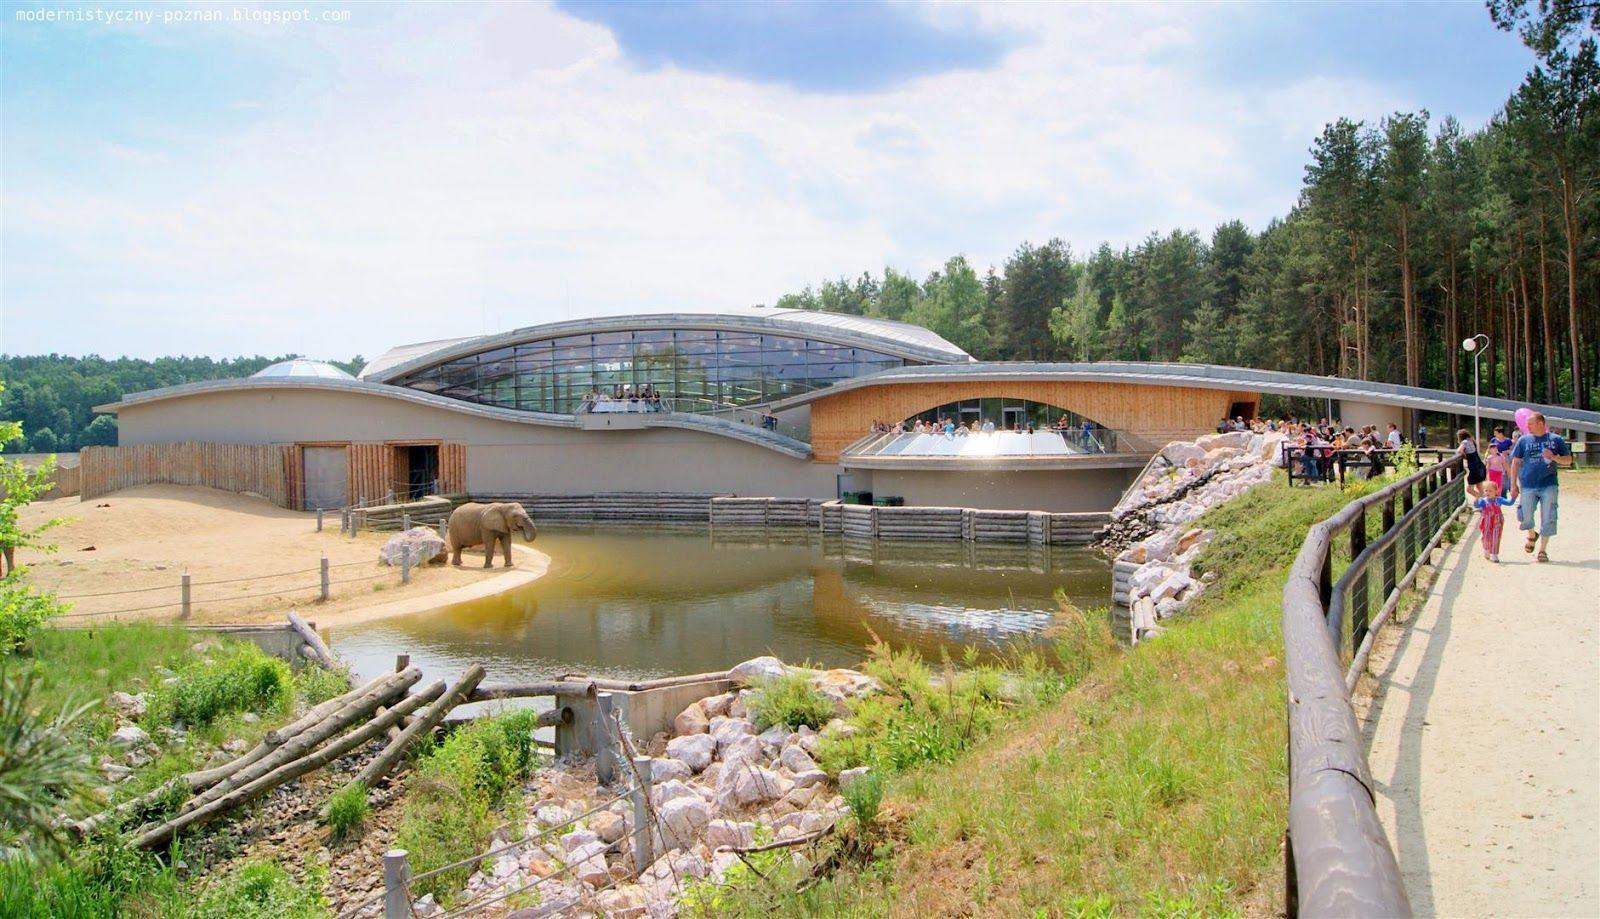 Poznan Zoo - Updates